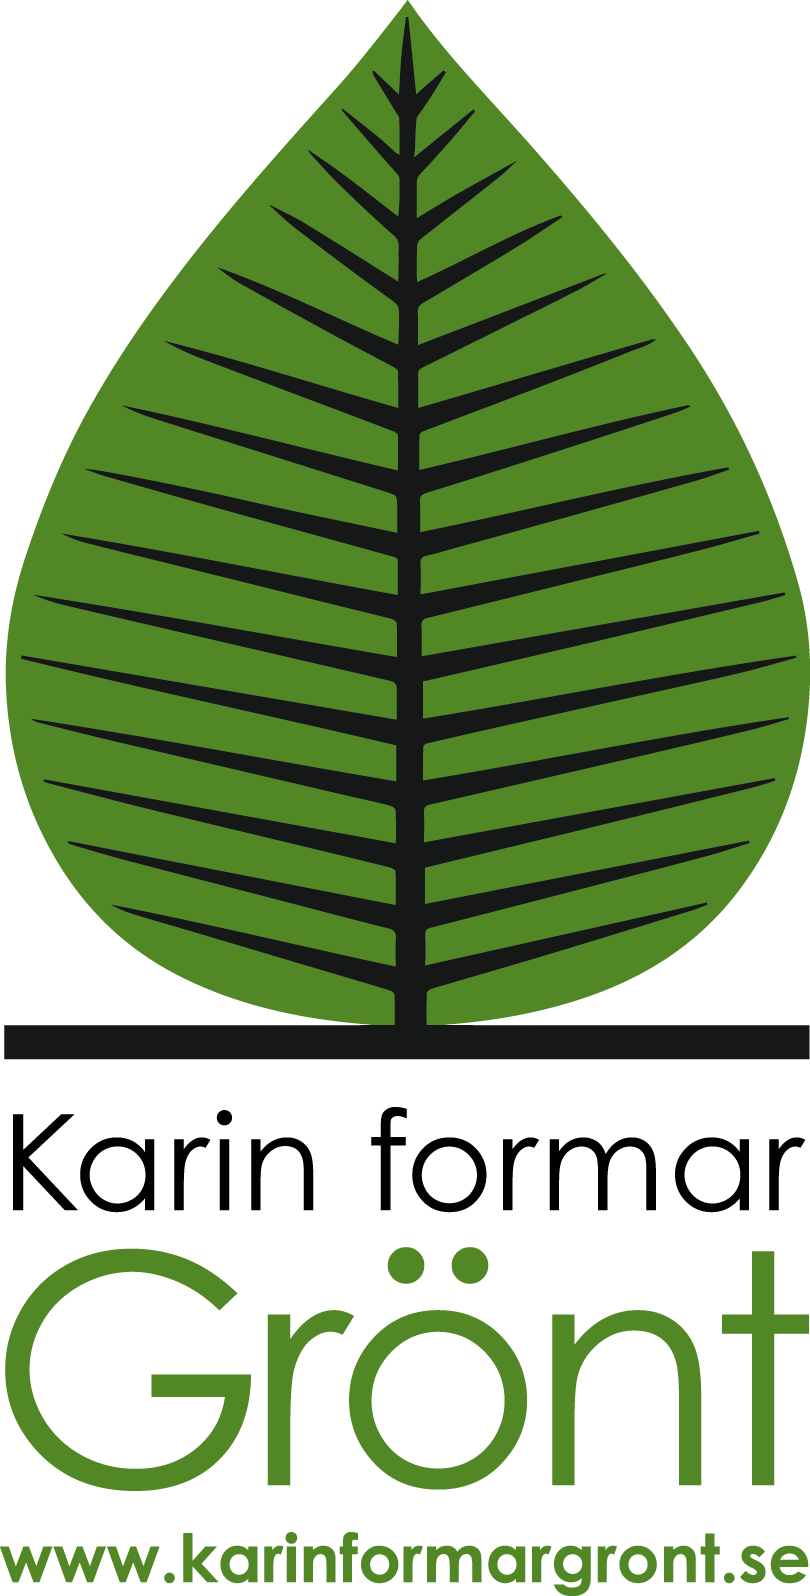 Karin formar Grönt logo